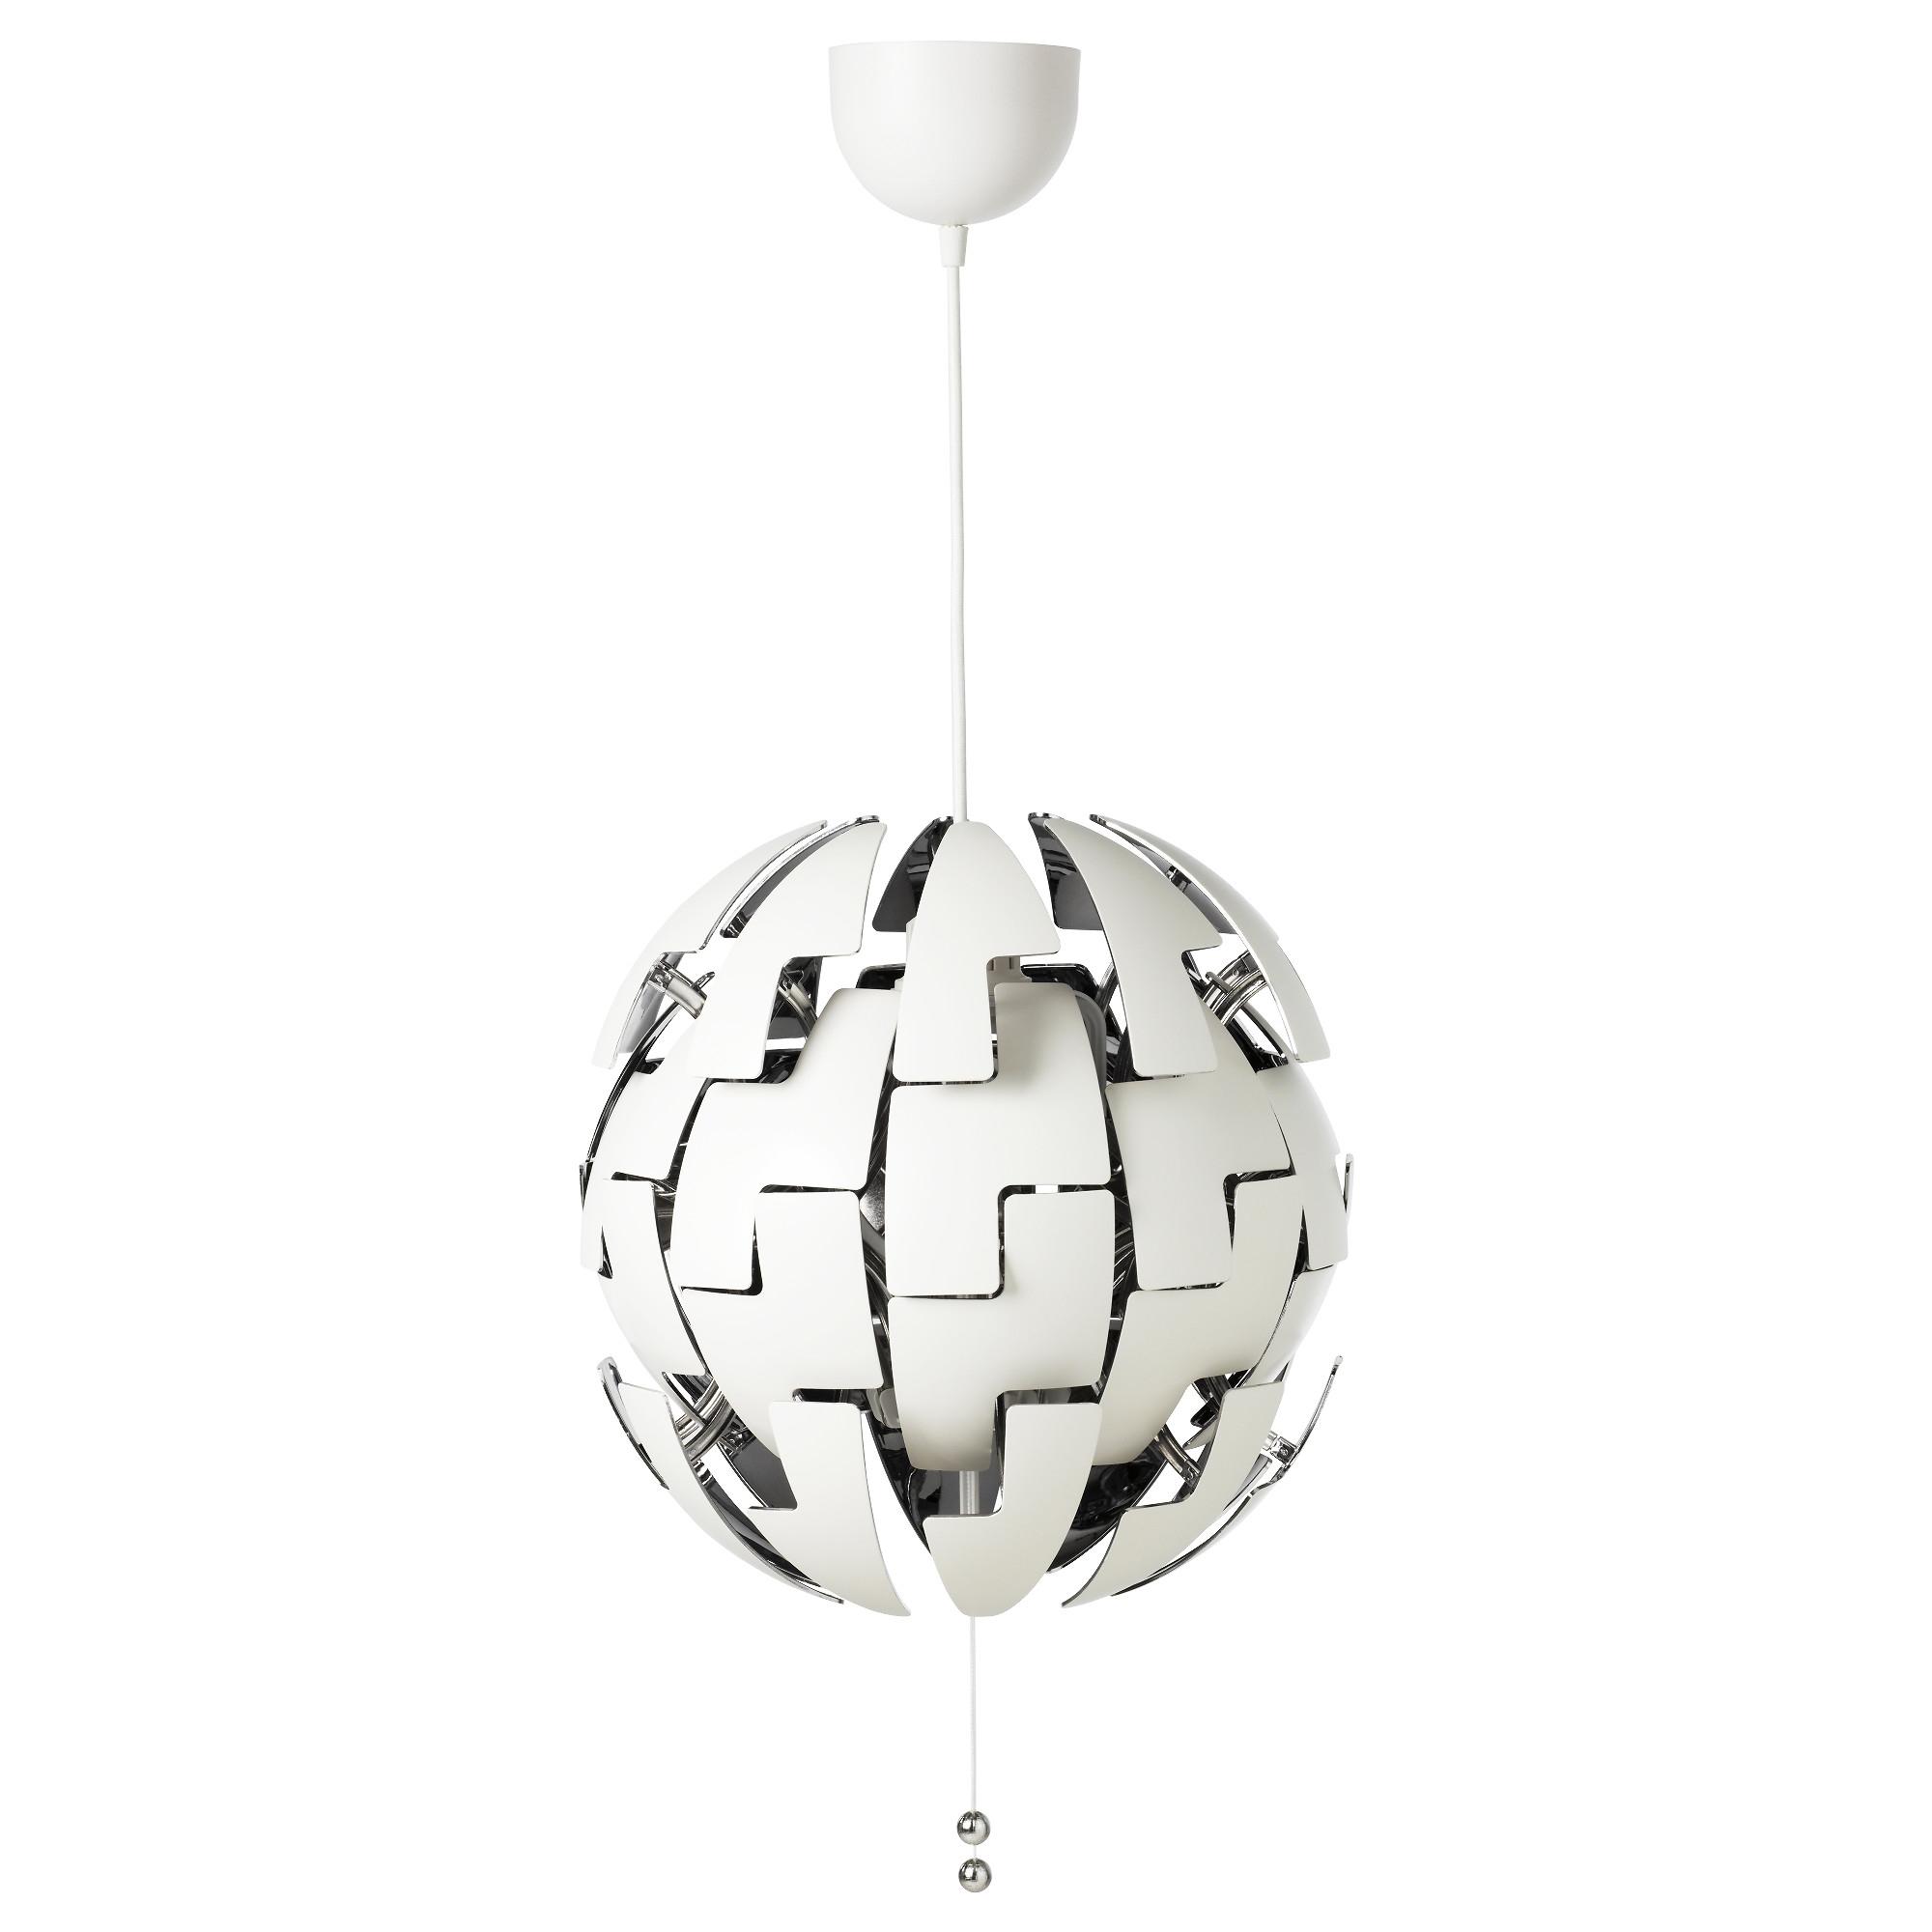 IKEA PS 2014 lámpara de techo Ø35cm blanco/gris plata